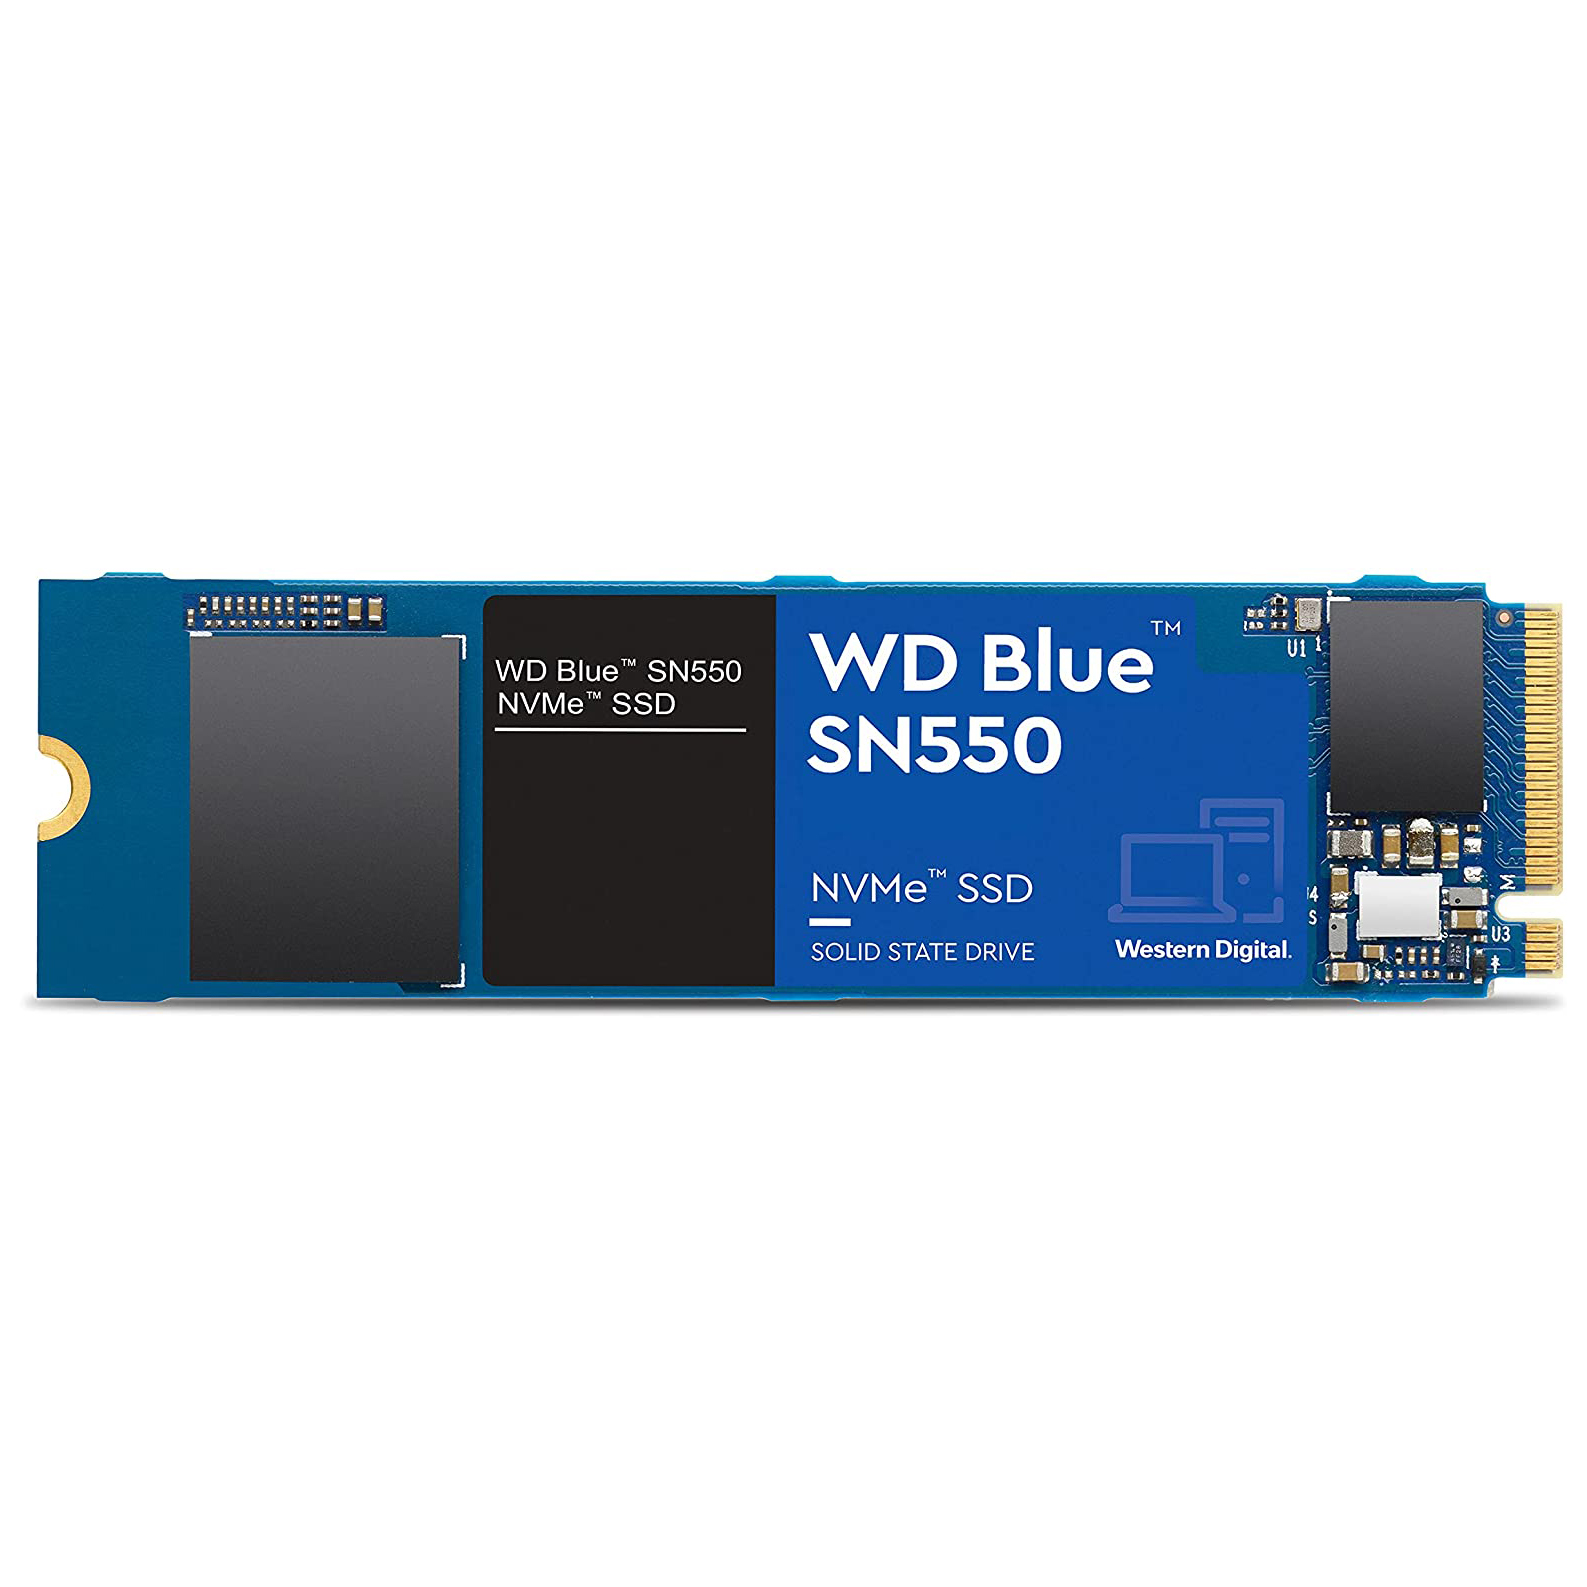 HDD SSD WD 500GB M.2 NVMe  WD BLUE SN550 ,SSD HDD